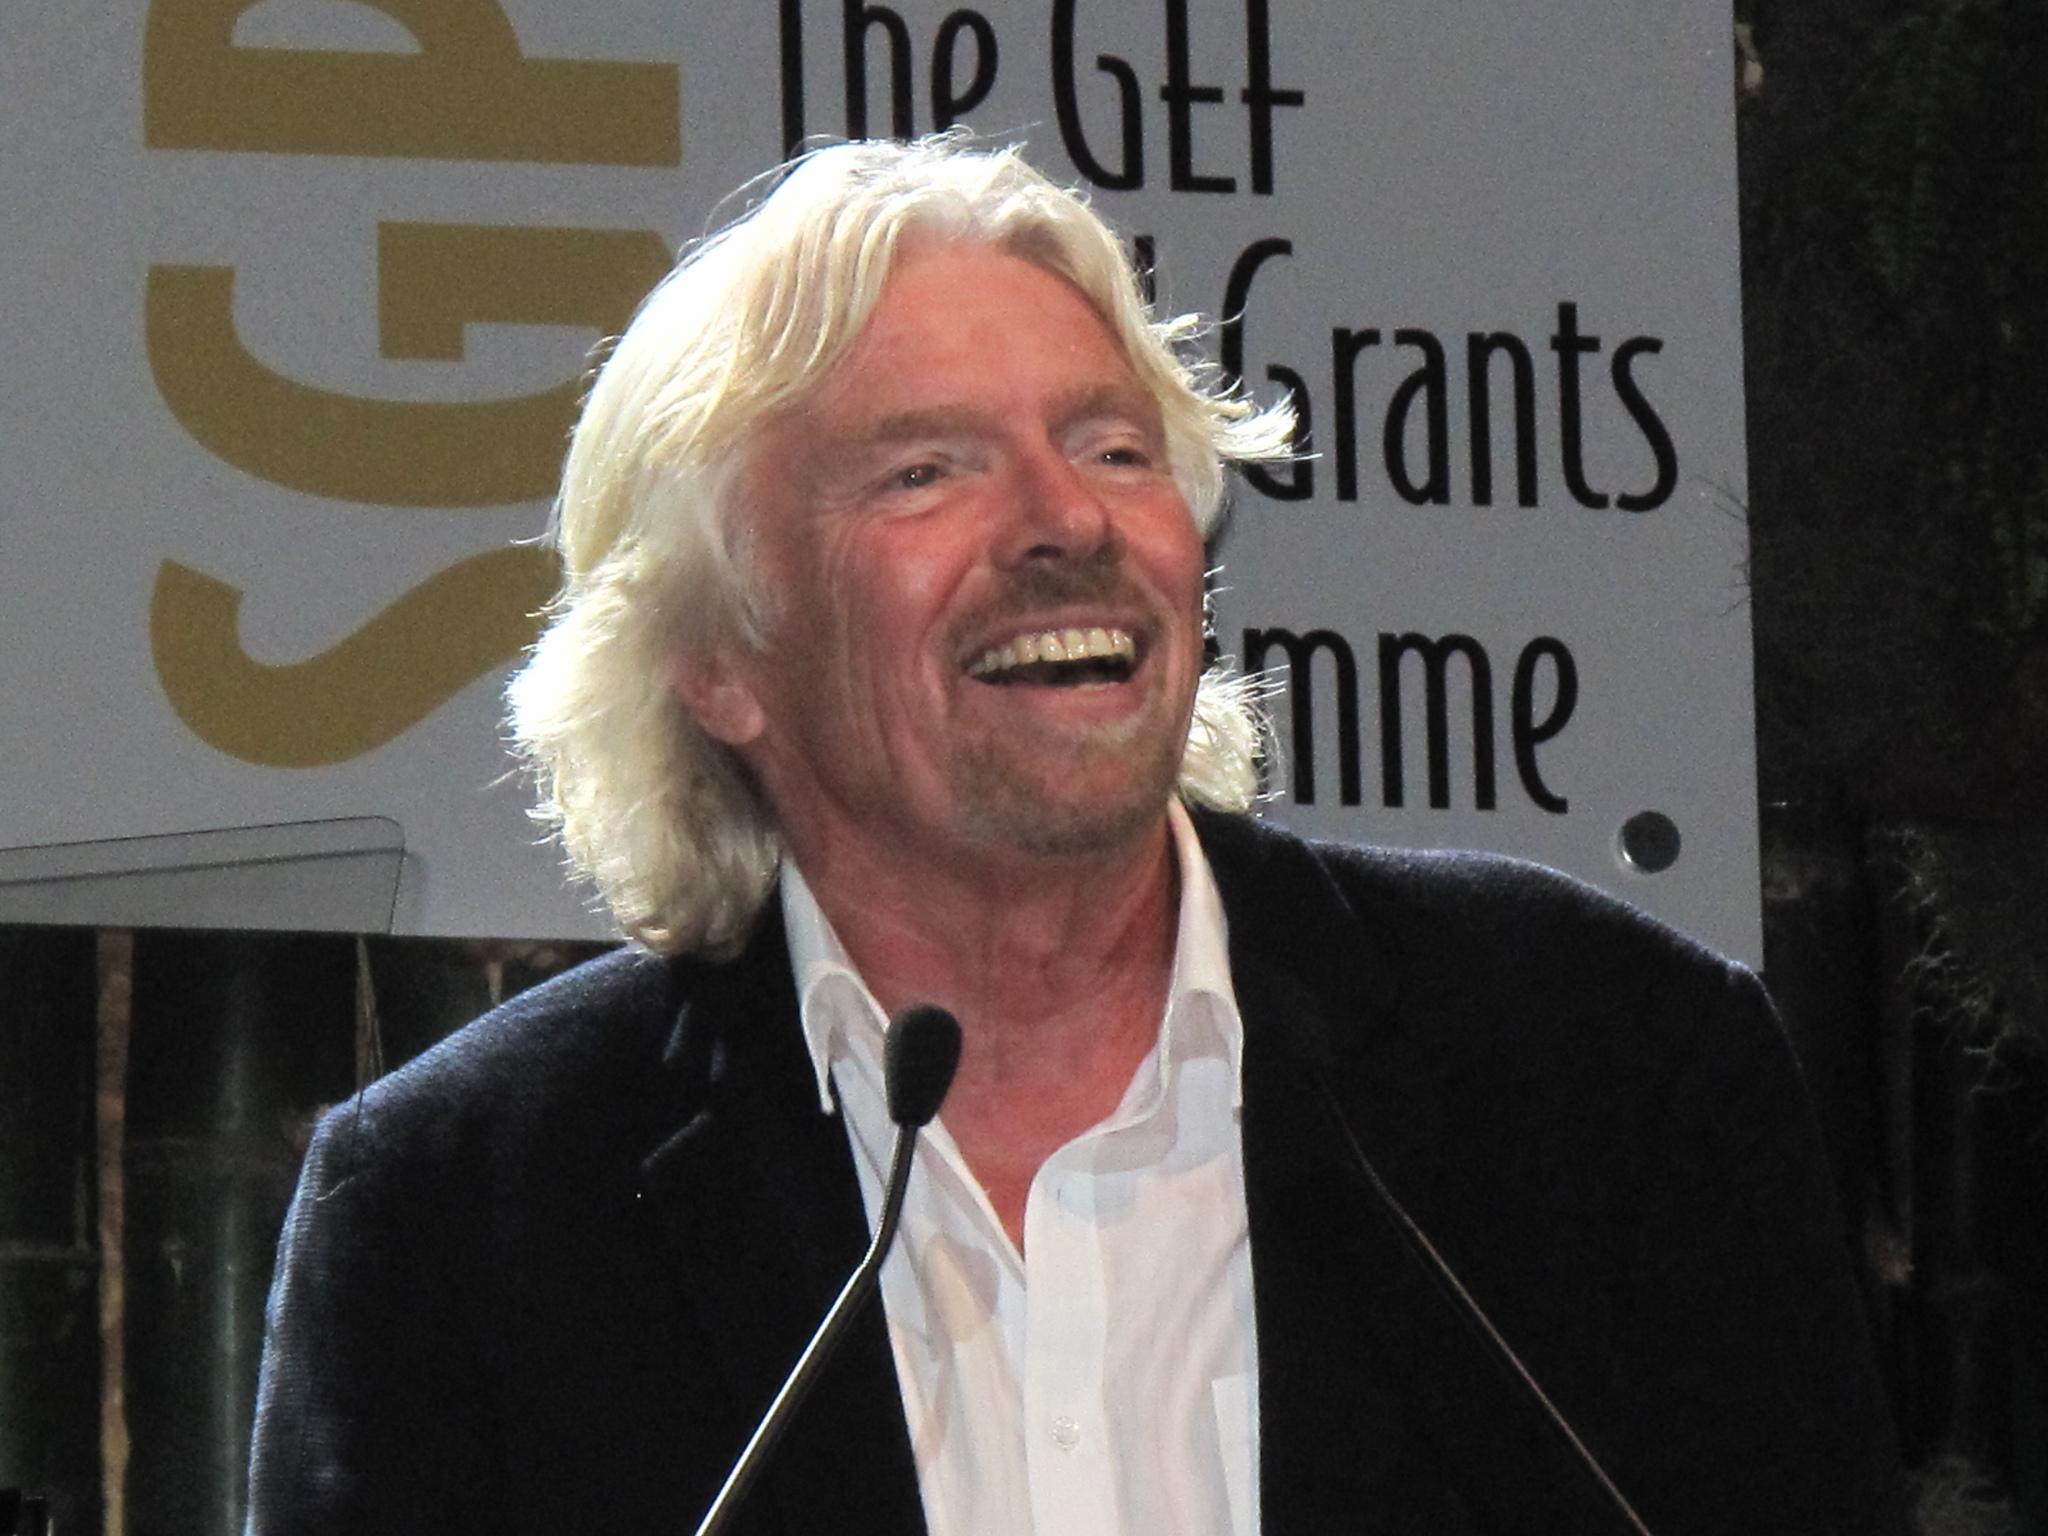 4-Richard Branson heeft in 2012 namens de Global Commission on Drug Policy de Cannabis Culture Award in ontvangst genomen (CC. UNclimatechange)